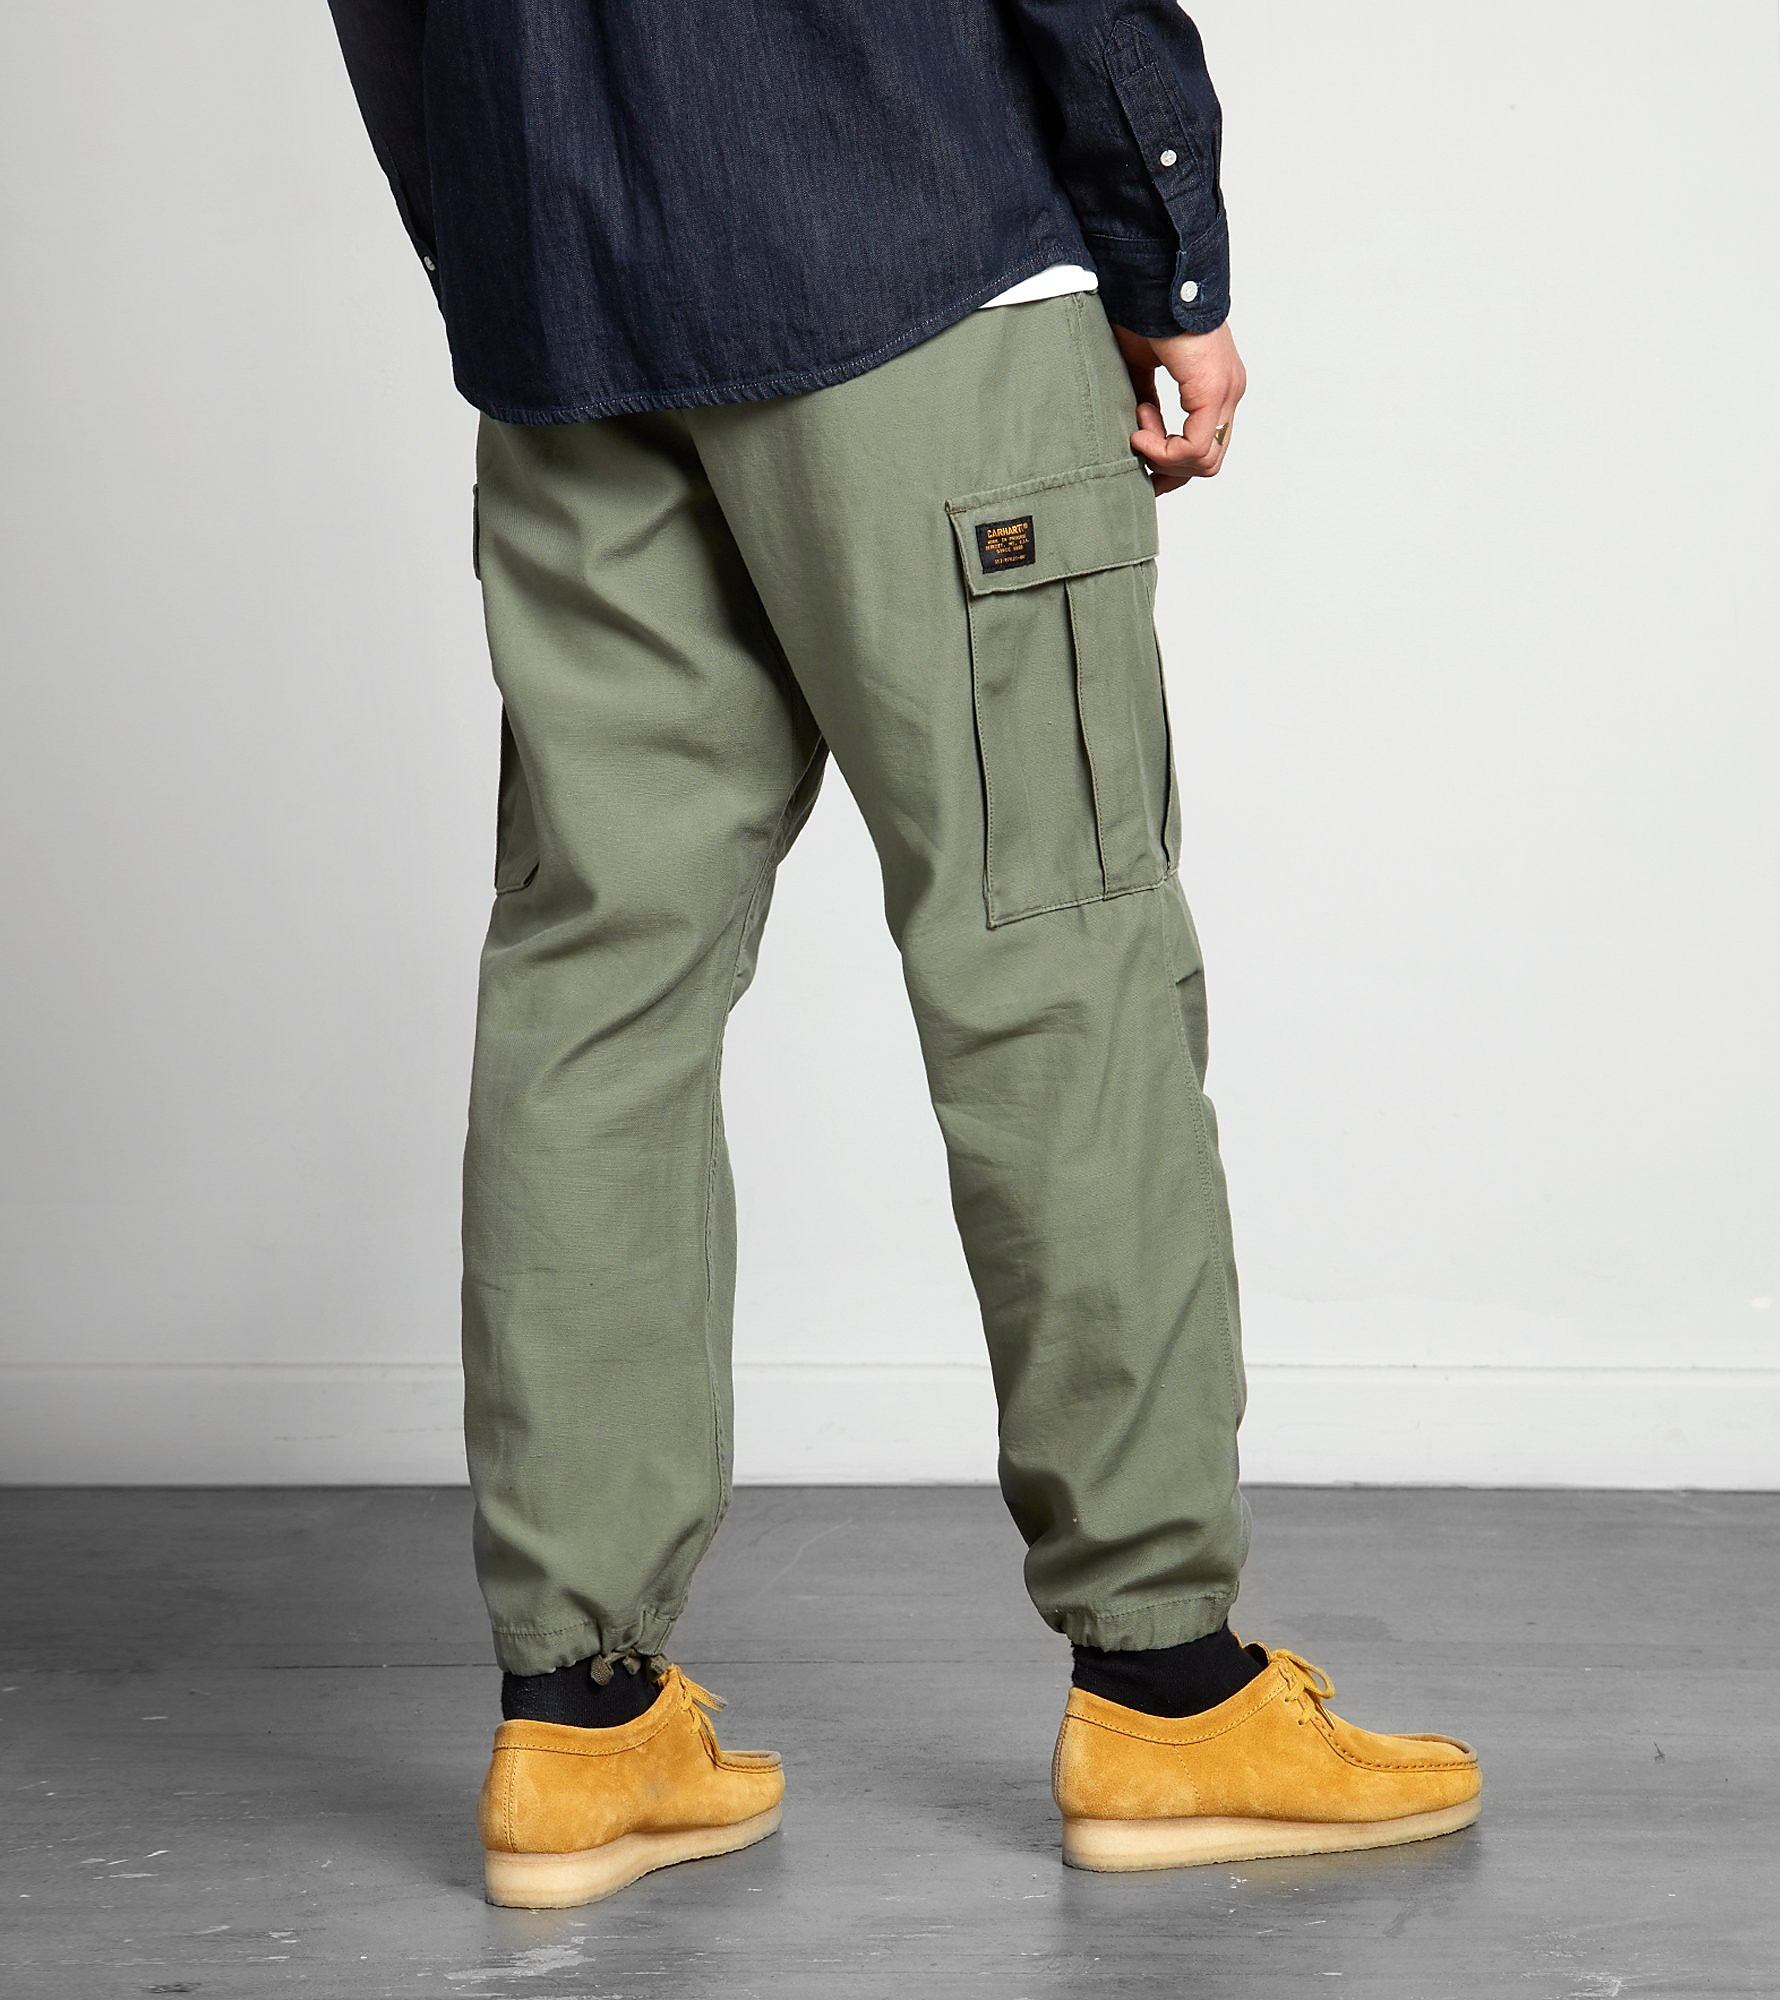 Carhartt WIP Camper Pants